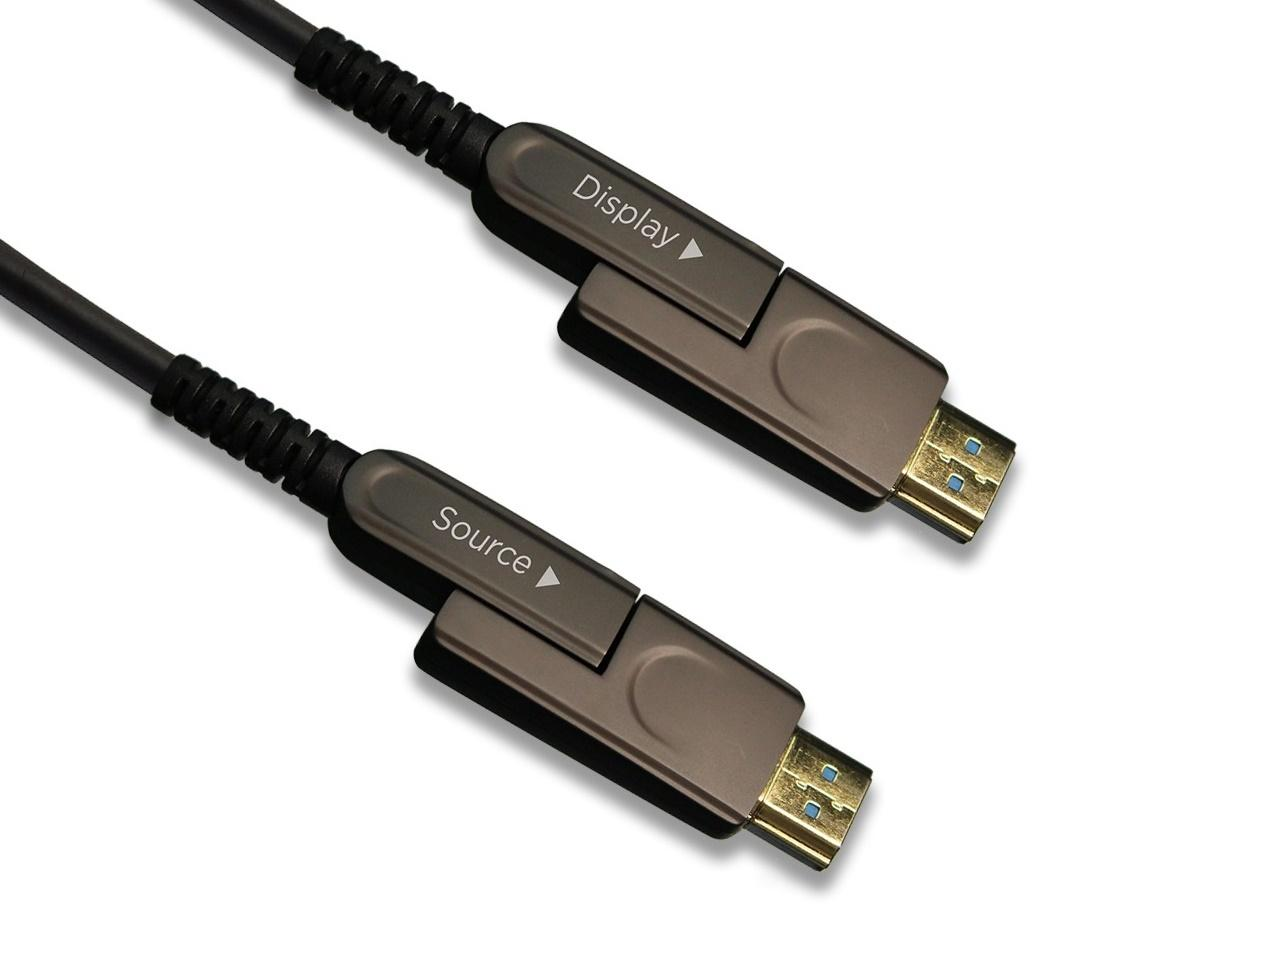 PureLink EZH2-DT-020 20m/66ft EZ Detachable HDMI 2.0 over Fiber Cable with TotalWire Technology